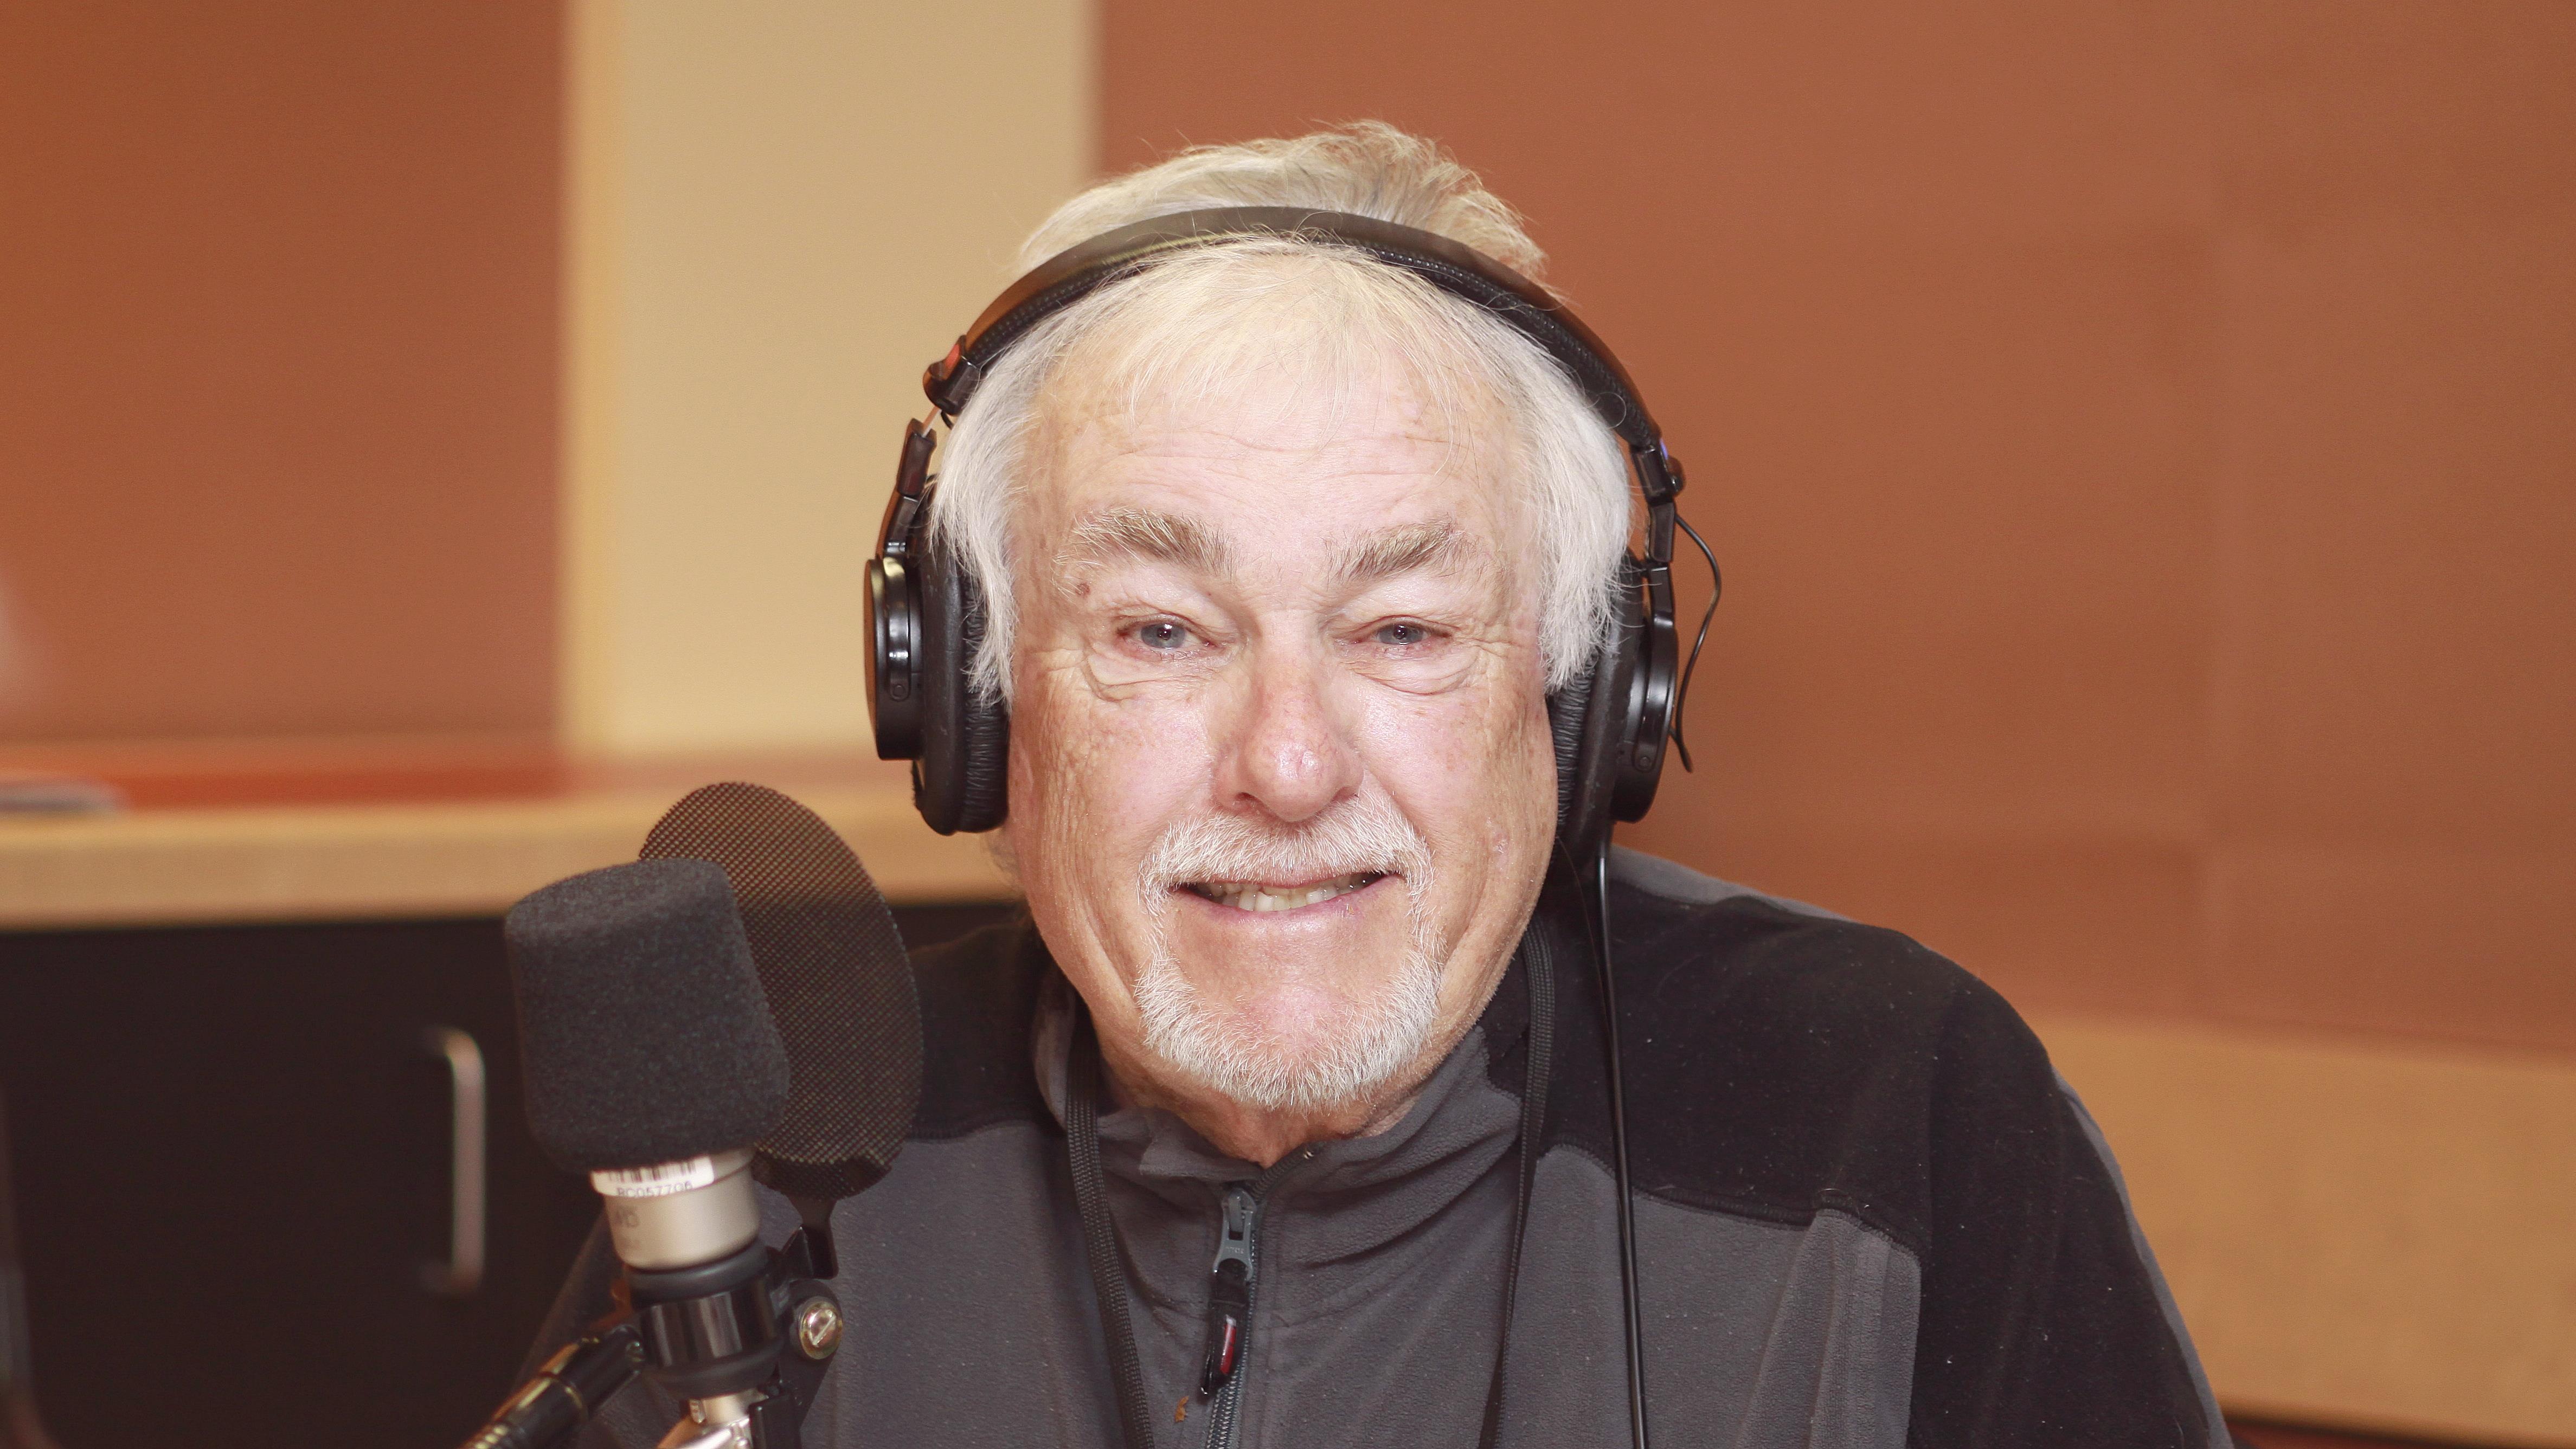 Guy Thibaudeau, souriant, au micro du studio 18 de Radio-Canada